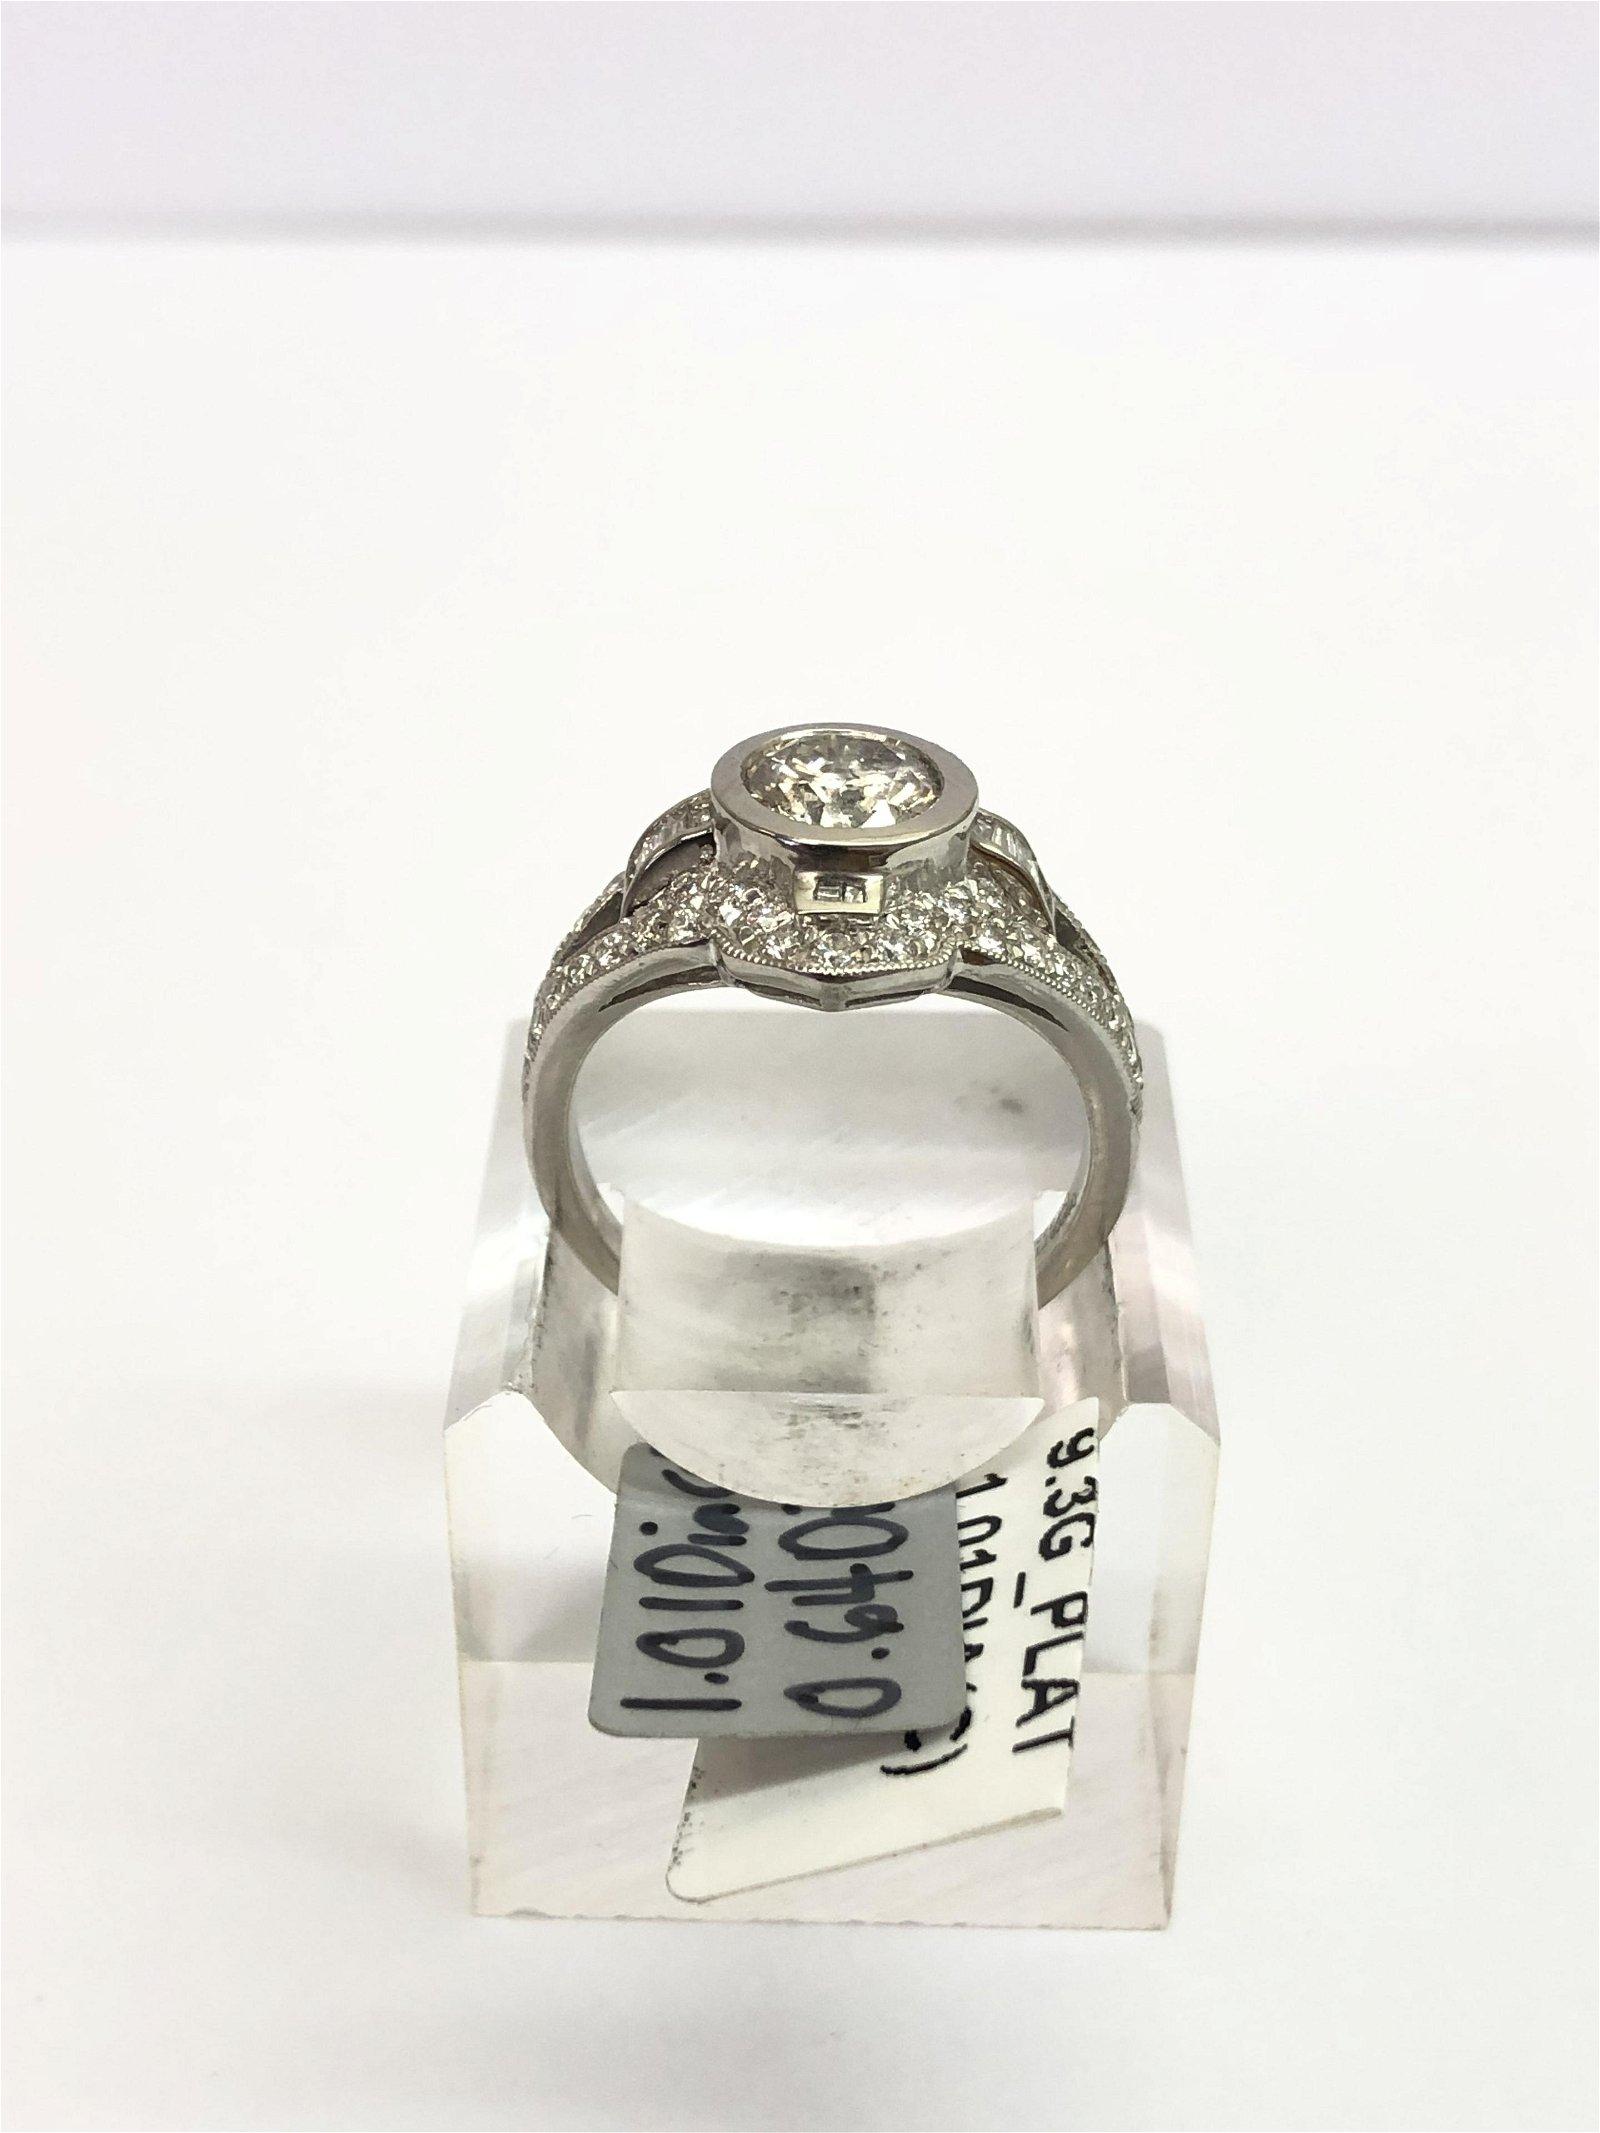 Certified Platinum 1.01ct Diamond Ring - Size 7, 58